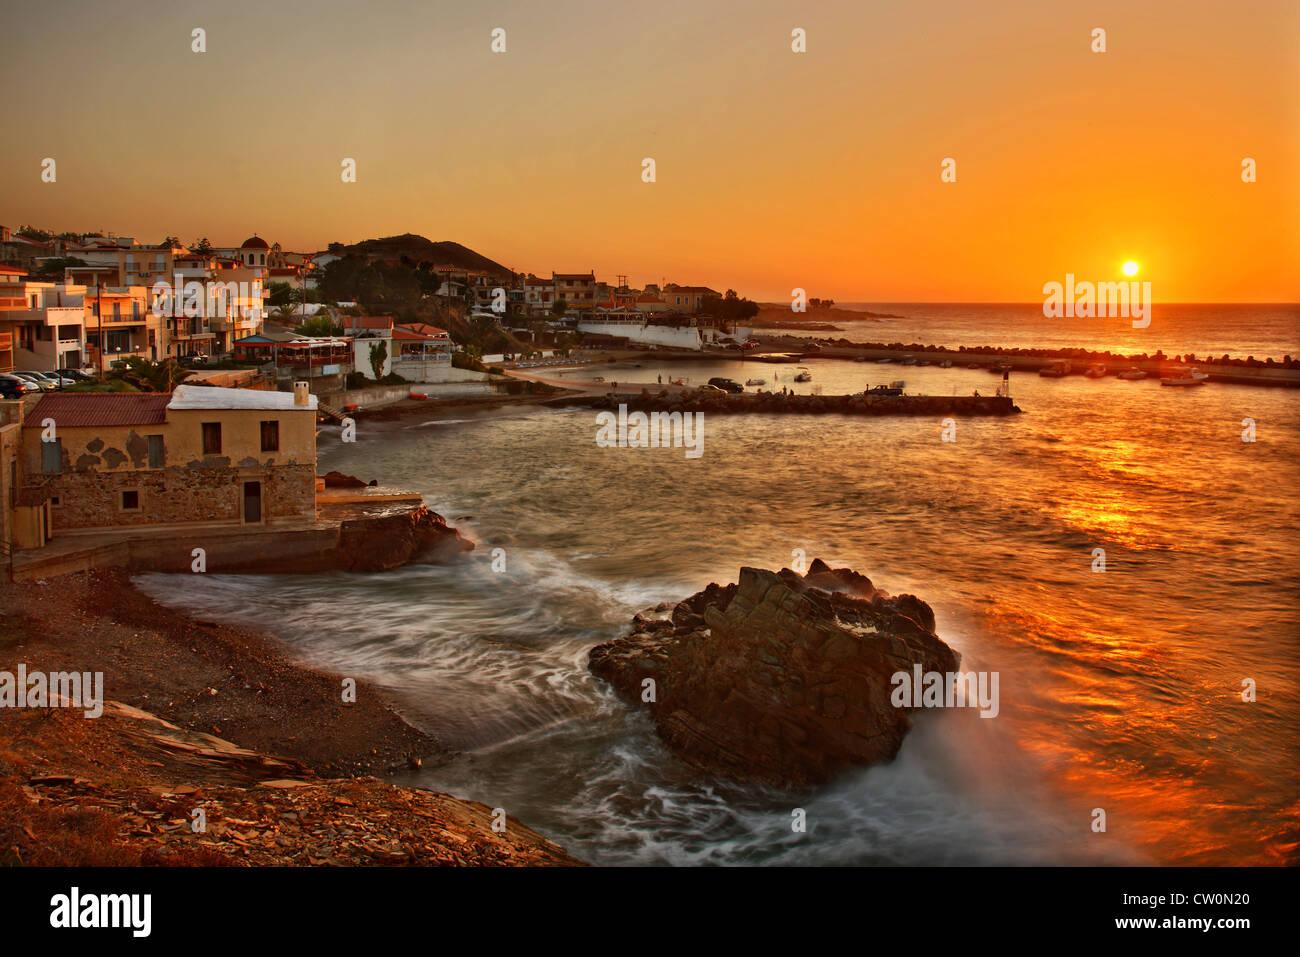 Sunset at Pamormos village, popular touristic resort, at Rethymnon prefecture, Crete, Greece - Stock Image